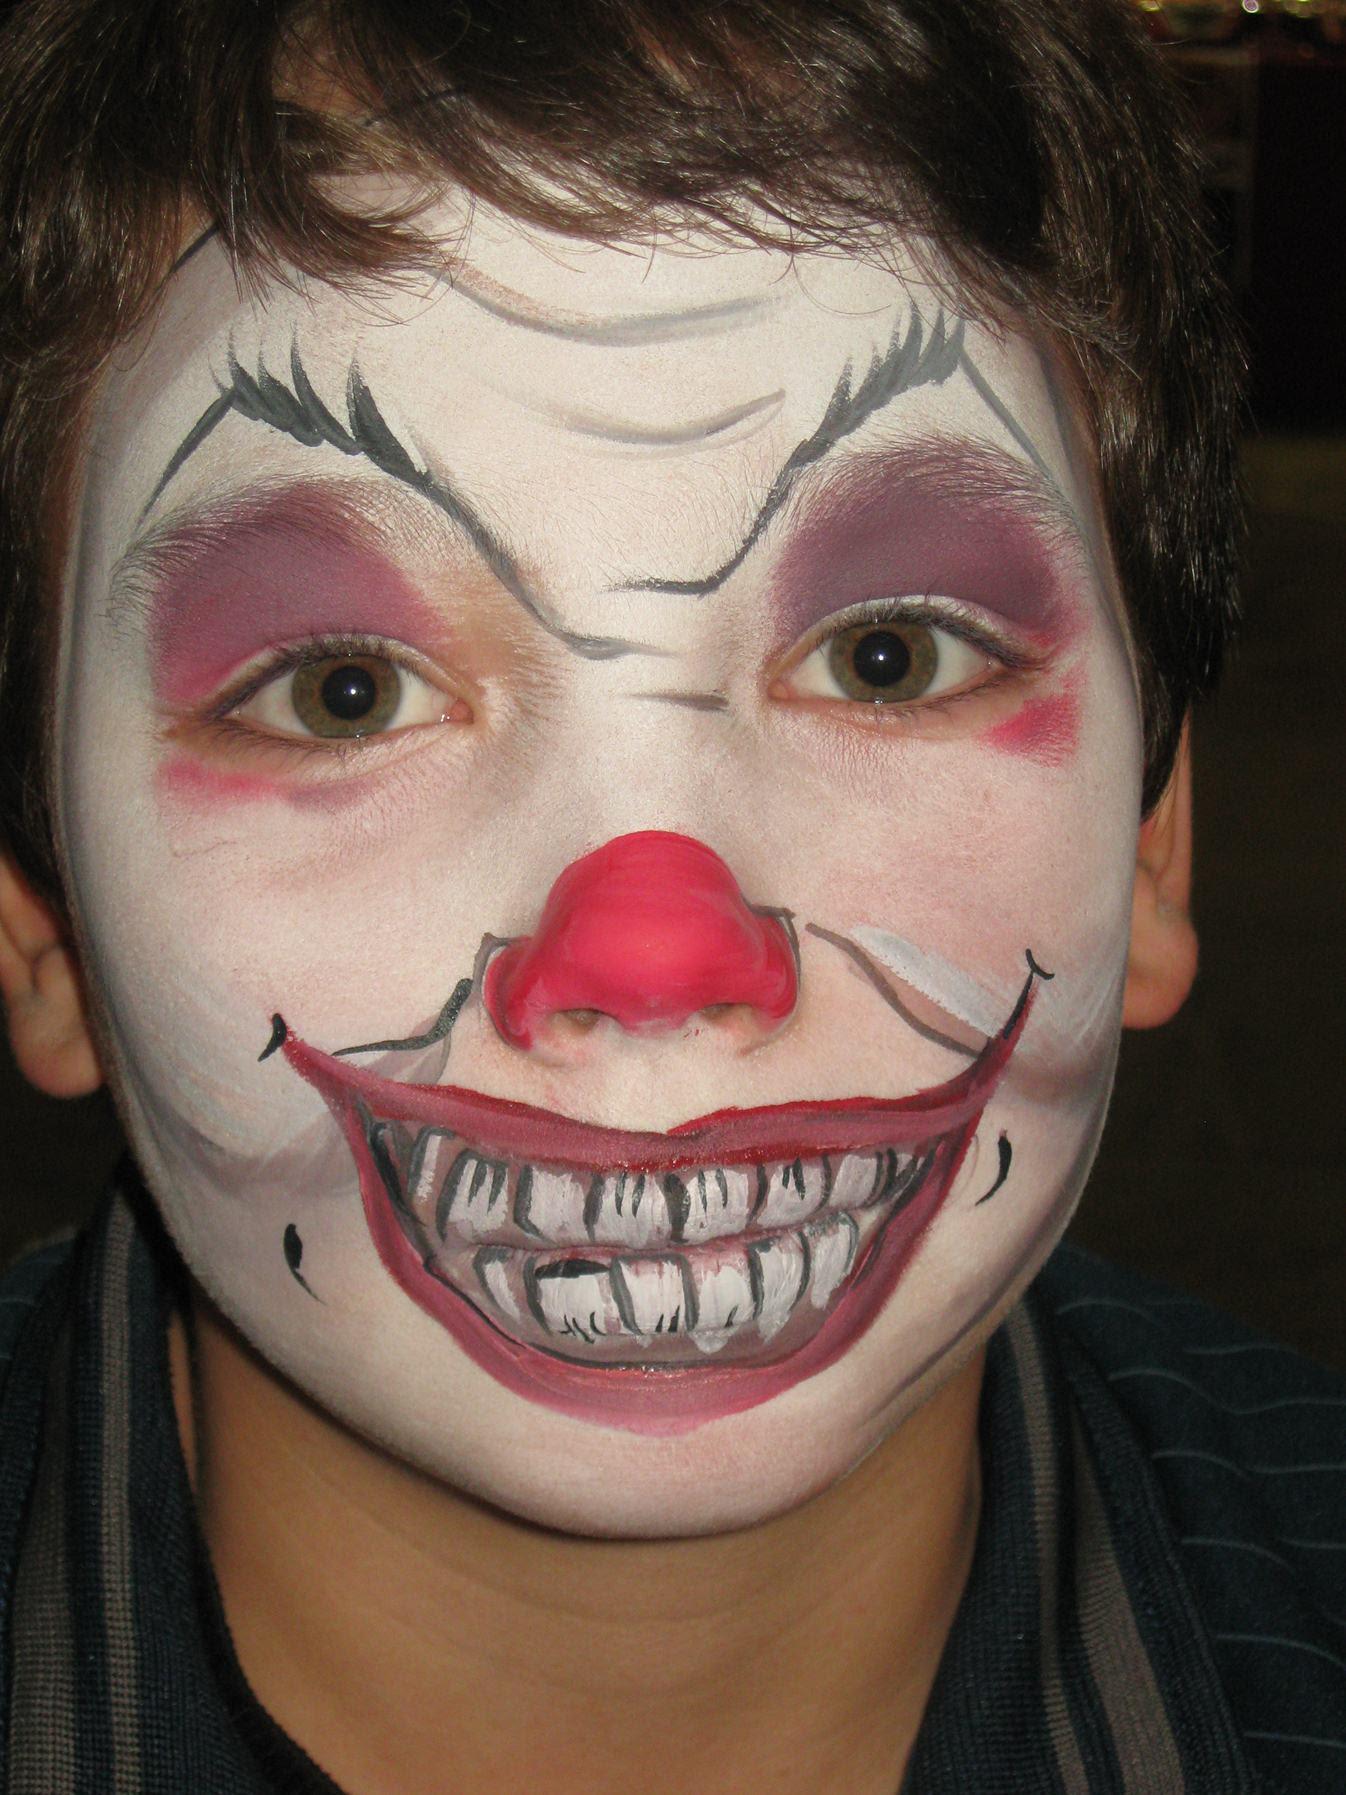 5 Tatoos Useful Evil Clown Face Tattoo Designs